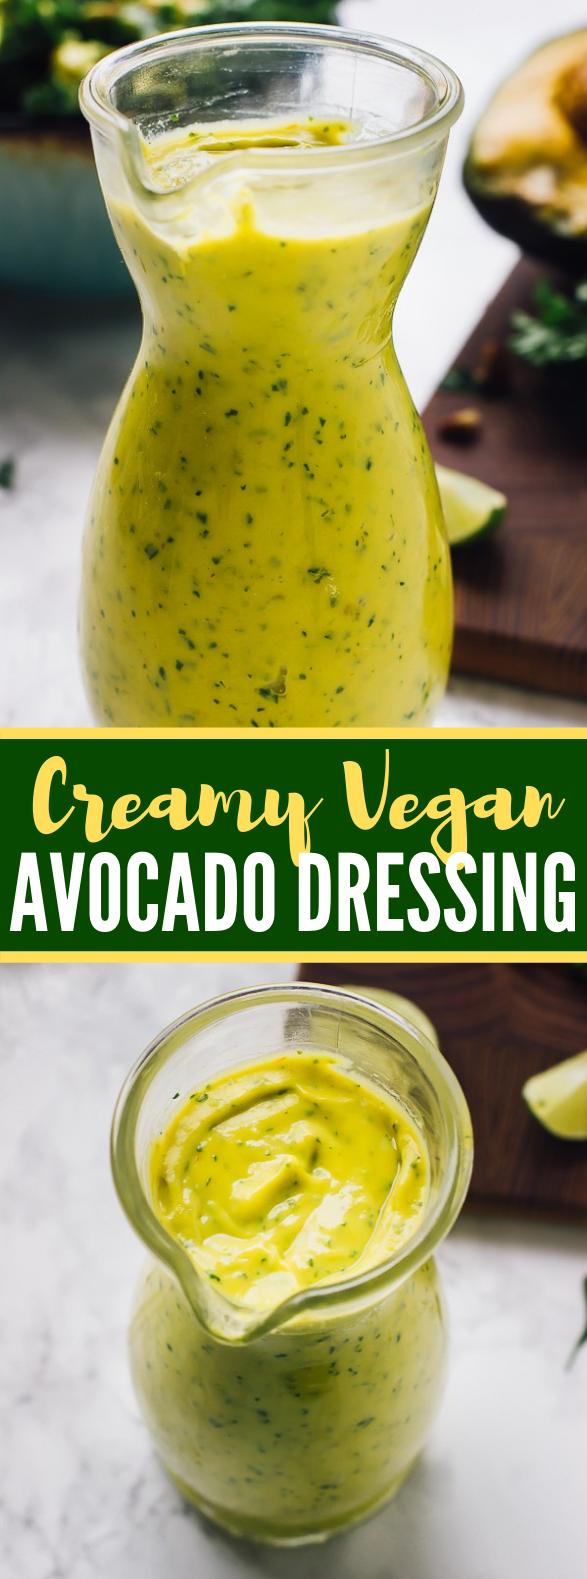 Creamy Vegan Avocado Dressing #veganrecipe #saladdressing